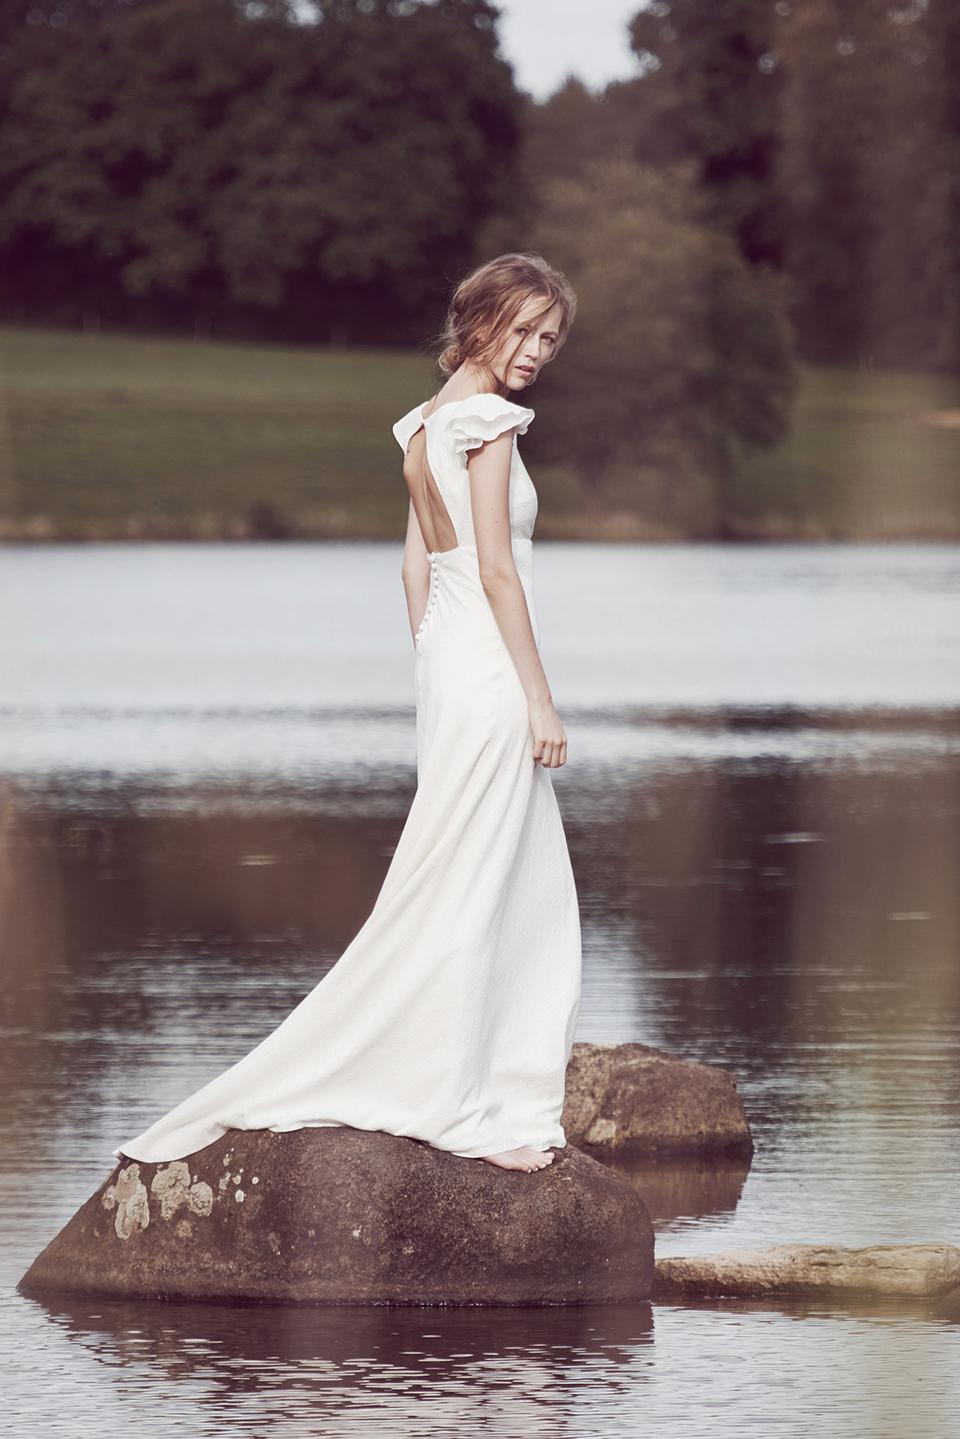 Mariage: Delphine Manivet